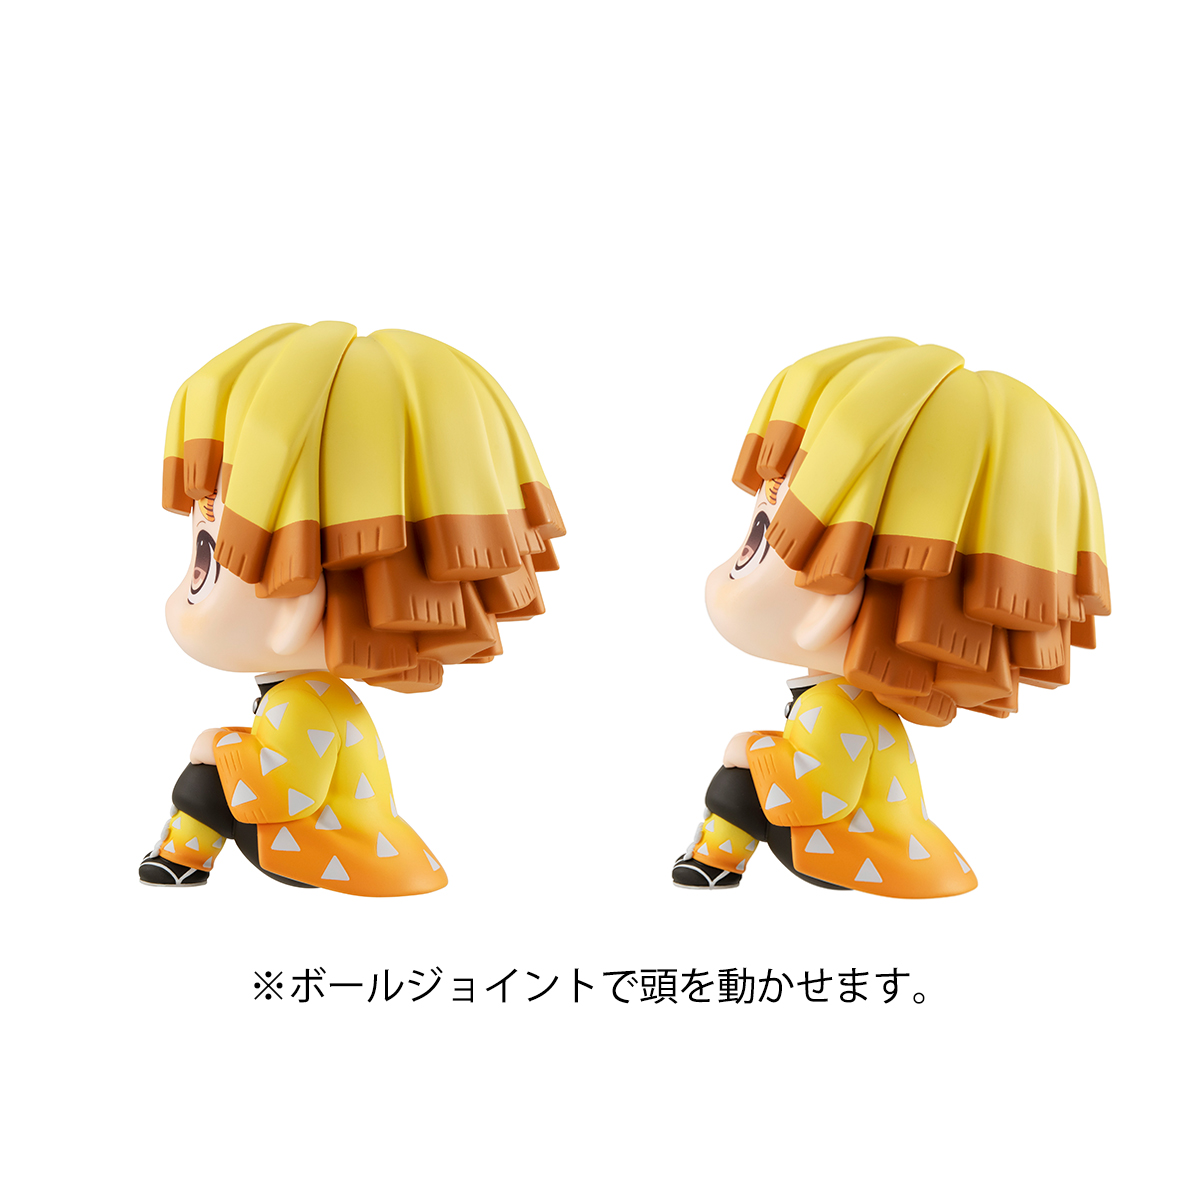 Zenitsu & Inosuke Look Up Series Demon Slayer Figure Set With Gift